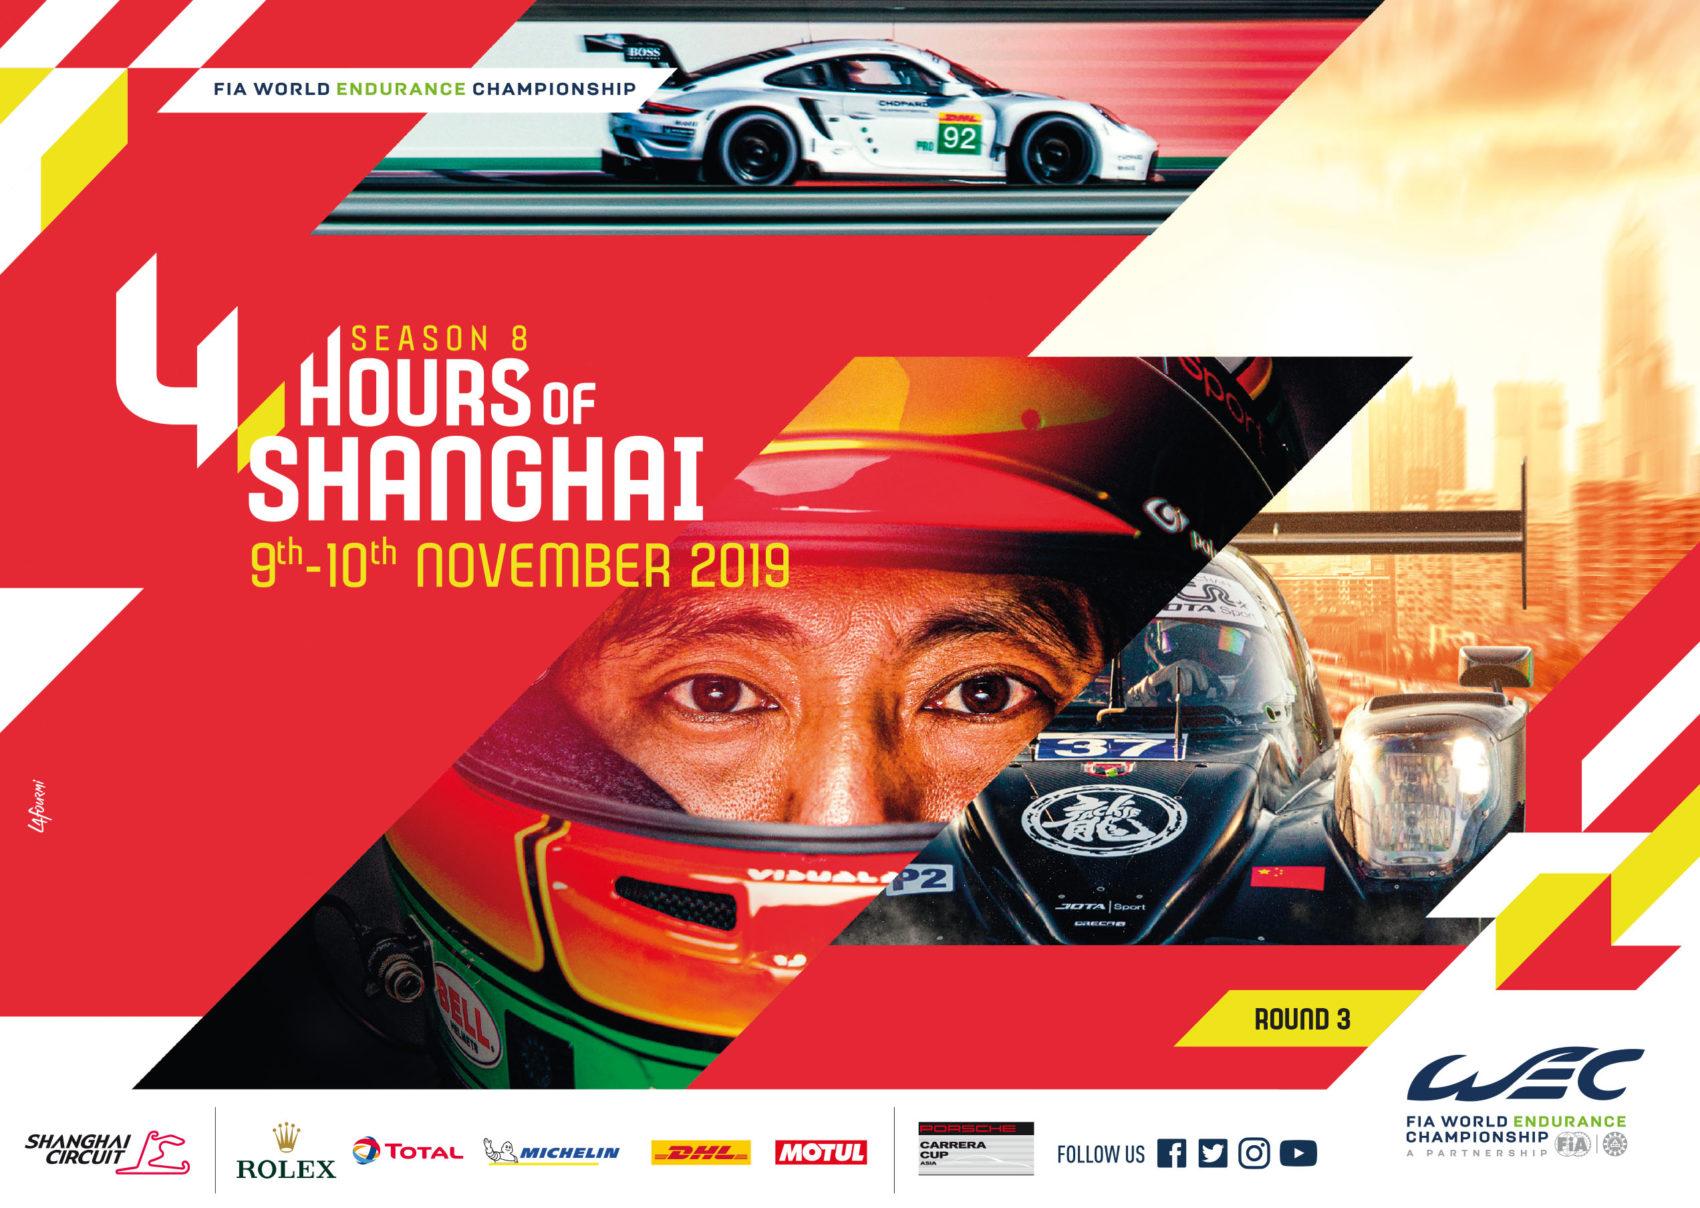 Projet_Project_WEC_FIA_world_endurance_championship_KV_shanghai